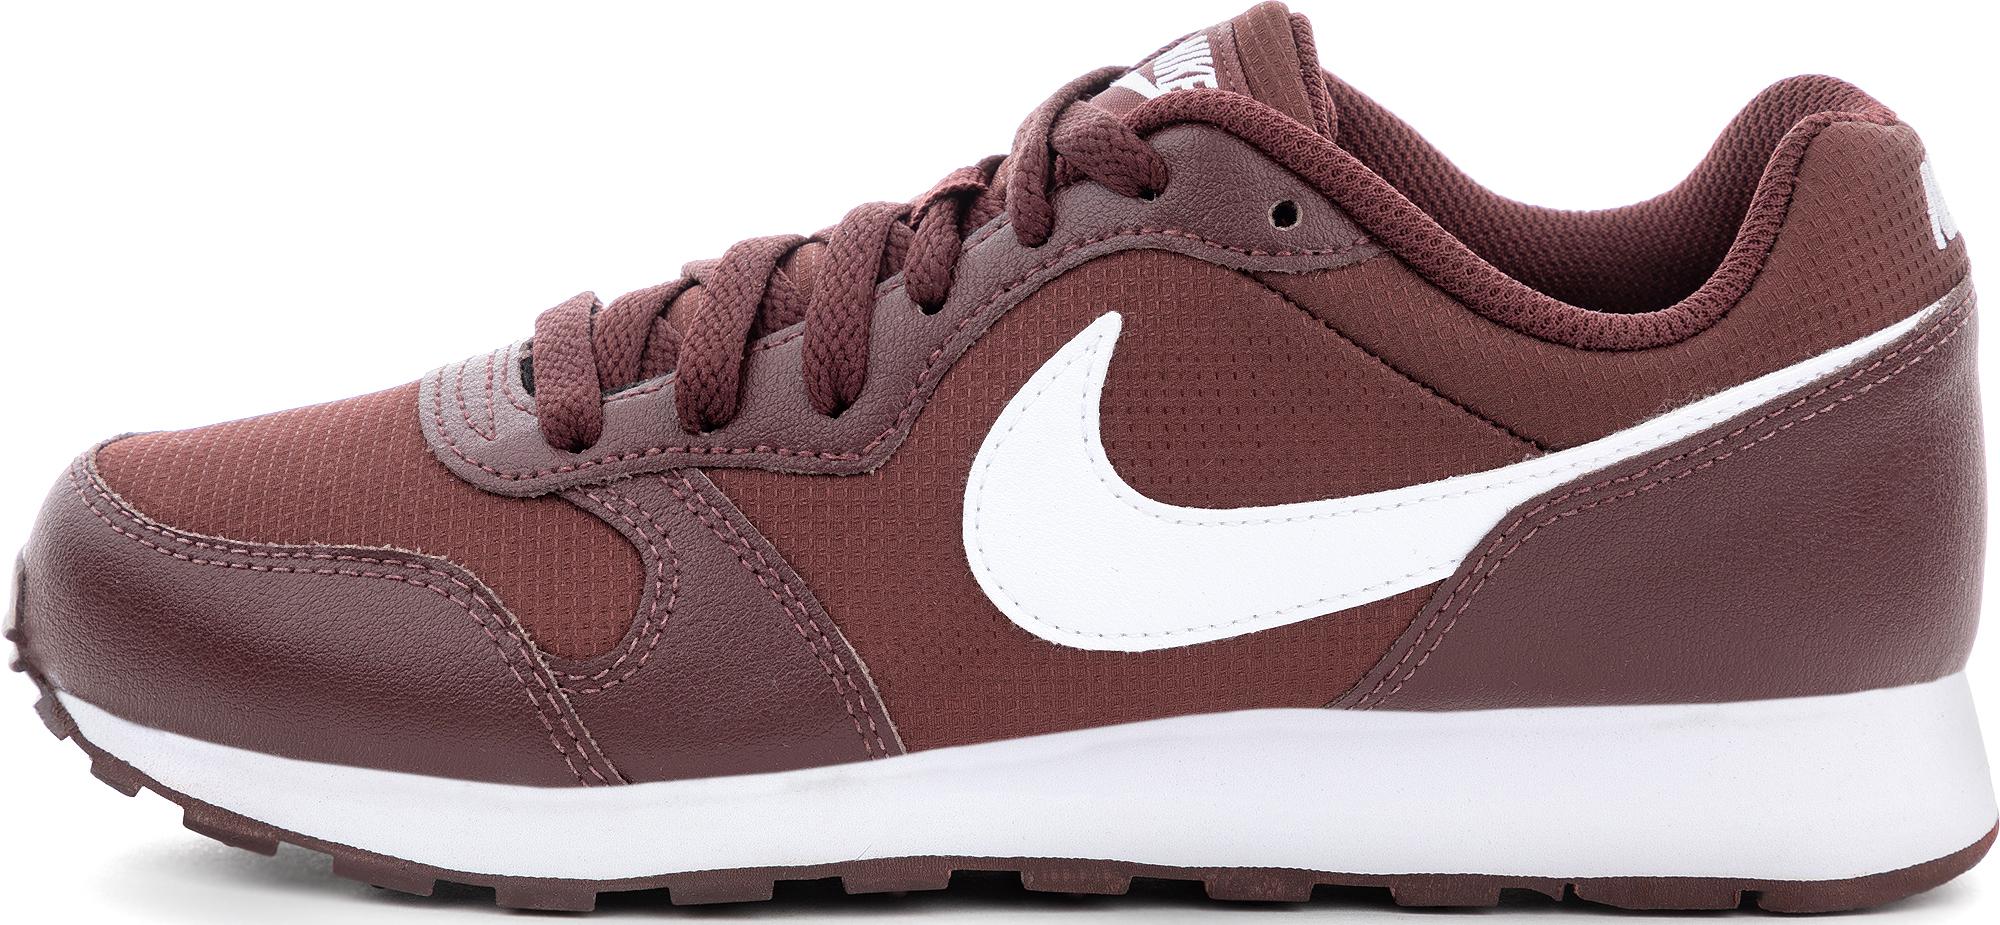 Nike Кроссовки детские MD Runner 2 PE, размер 35,5